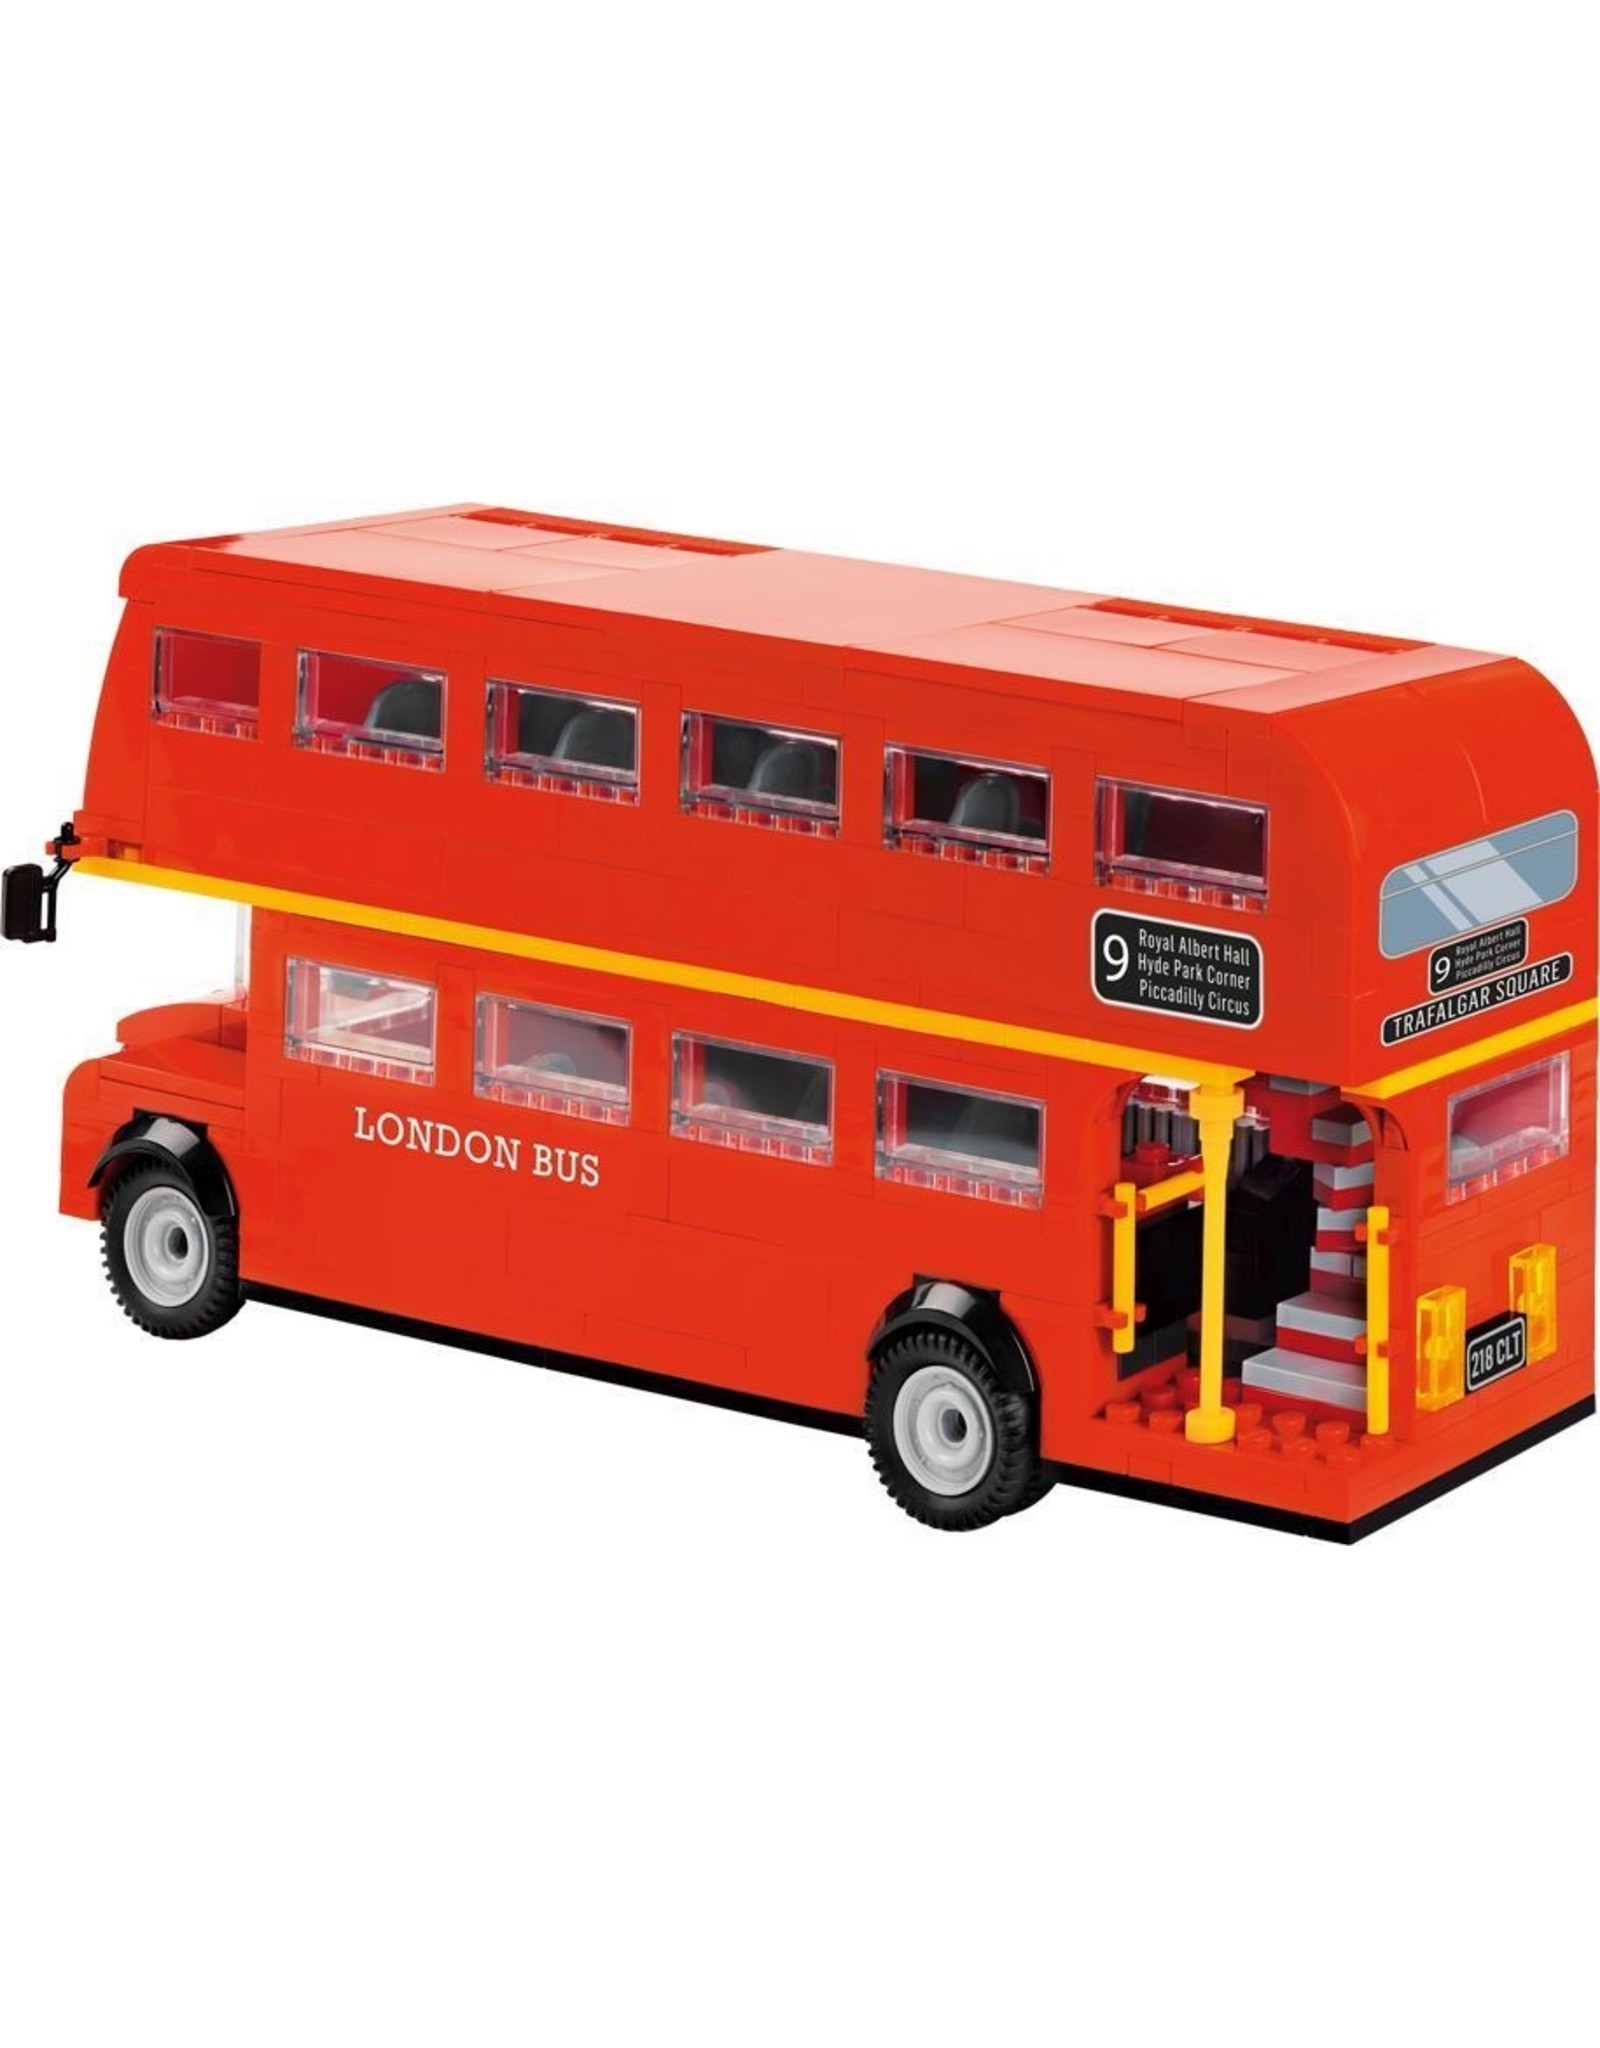 COBI COBI 1885 - Londen Bus